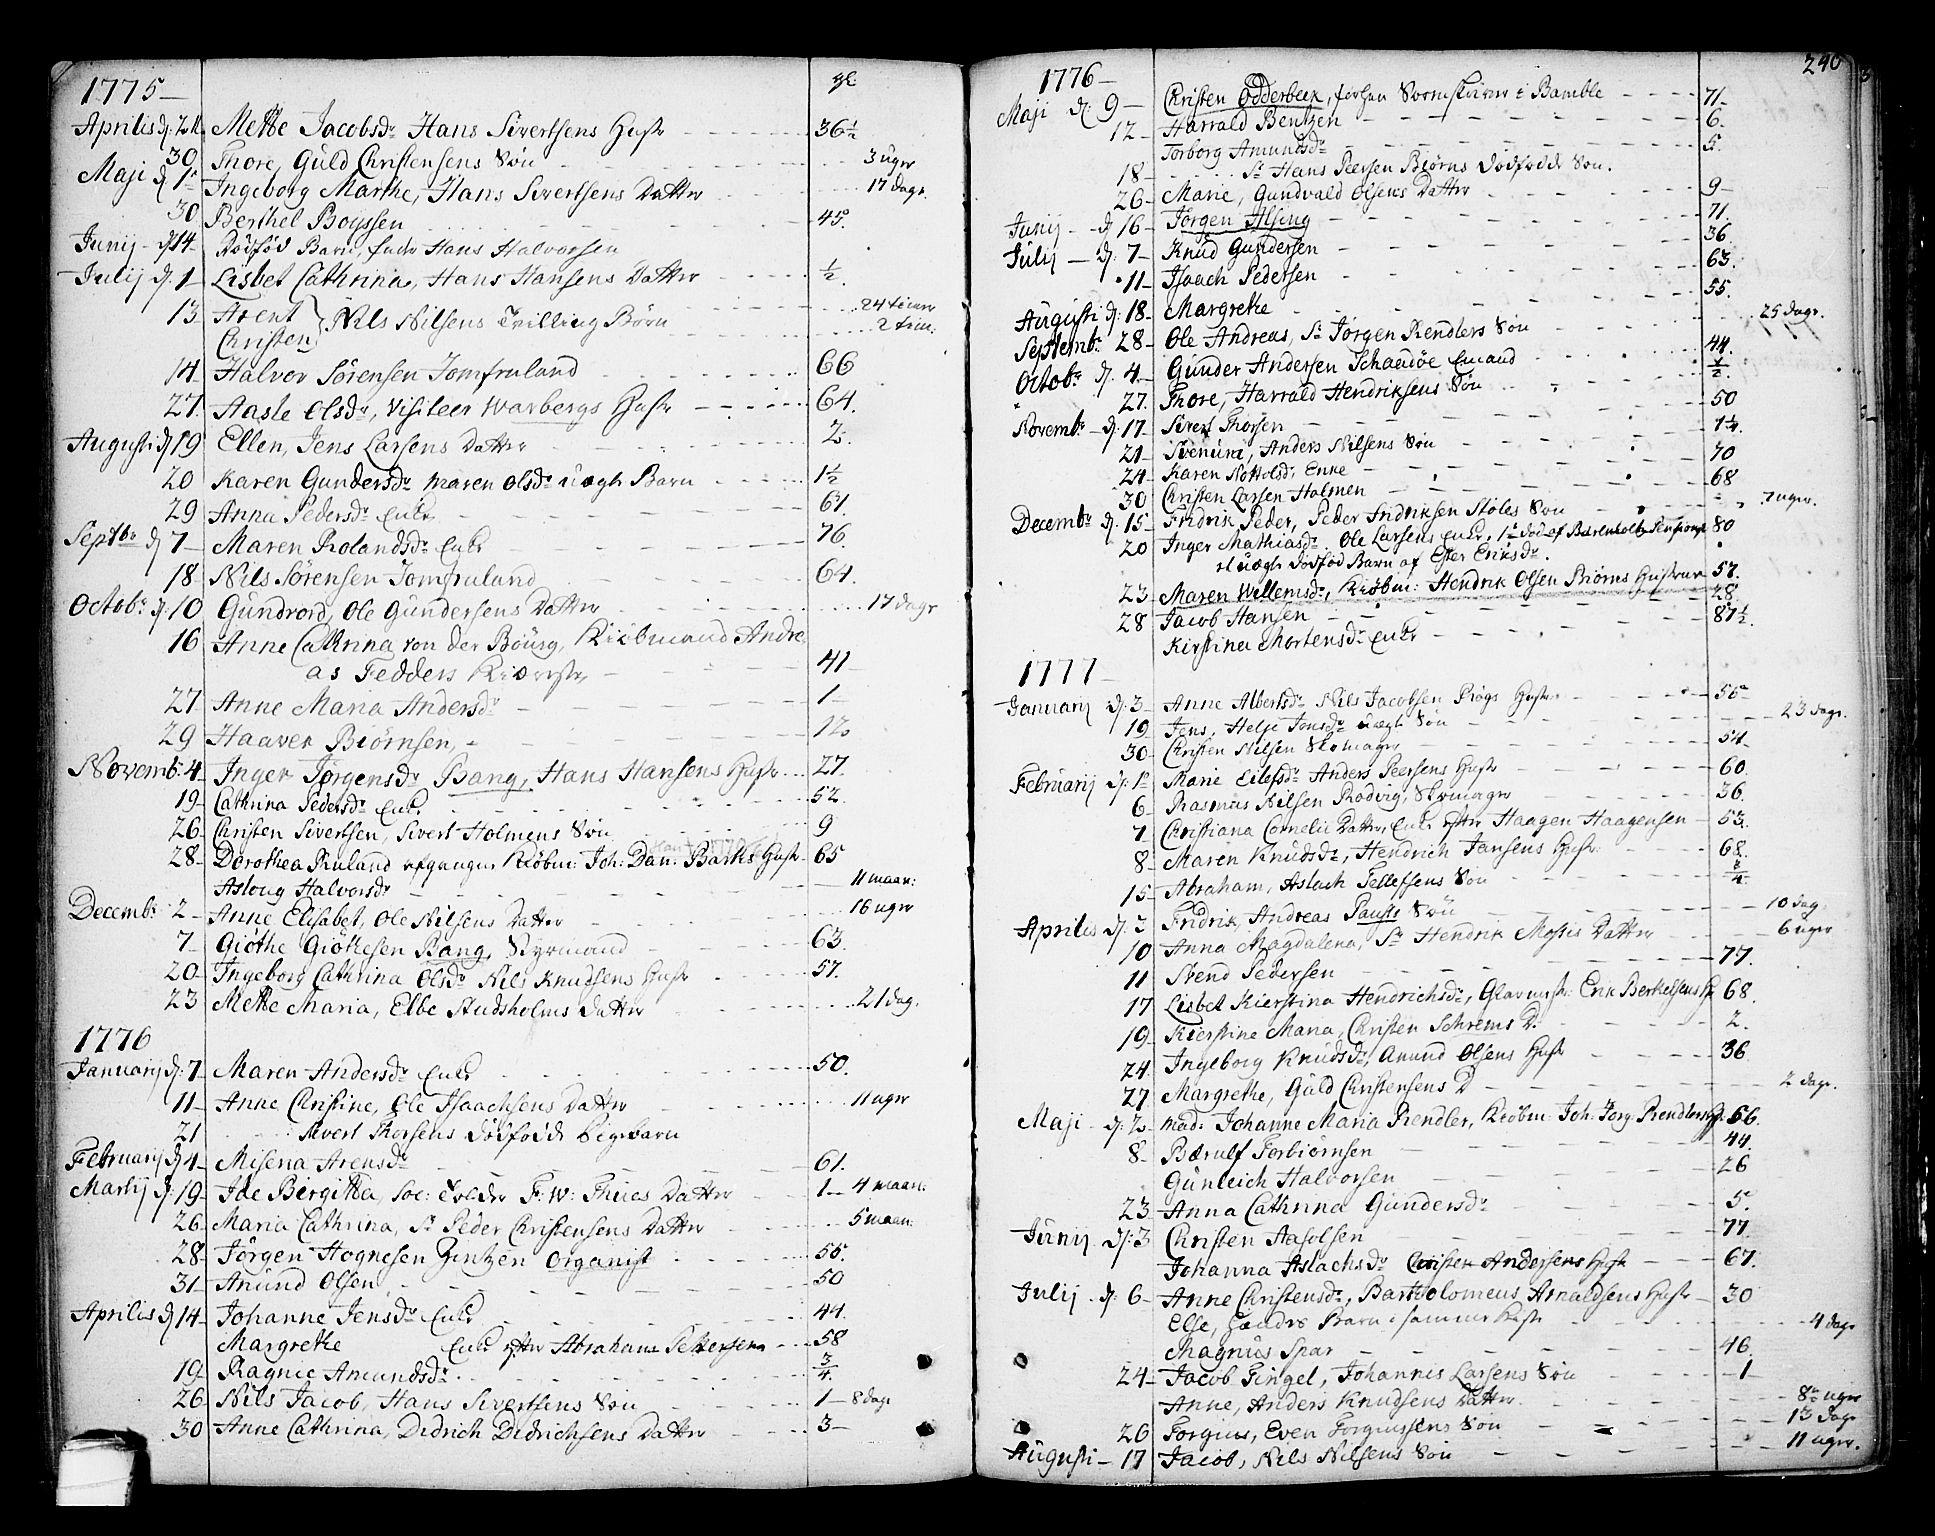 SAKO, Kragerø kirkebøker, F/Fa/L0002: Ministerialbok nr. 2, 1767-1802, s. 240